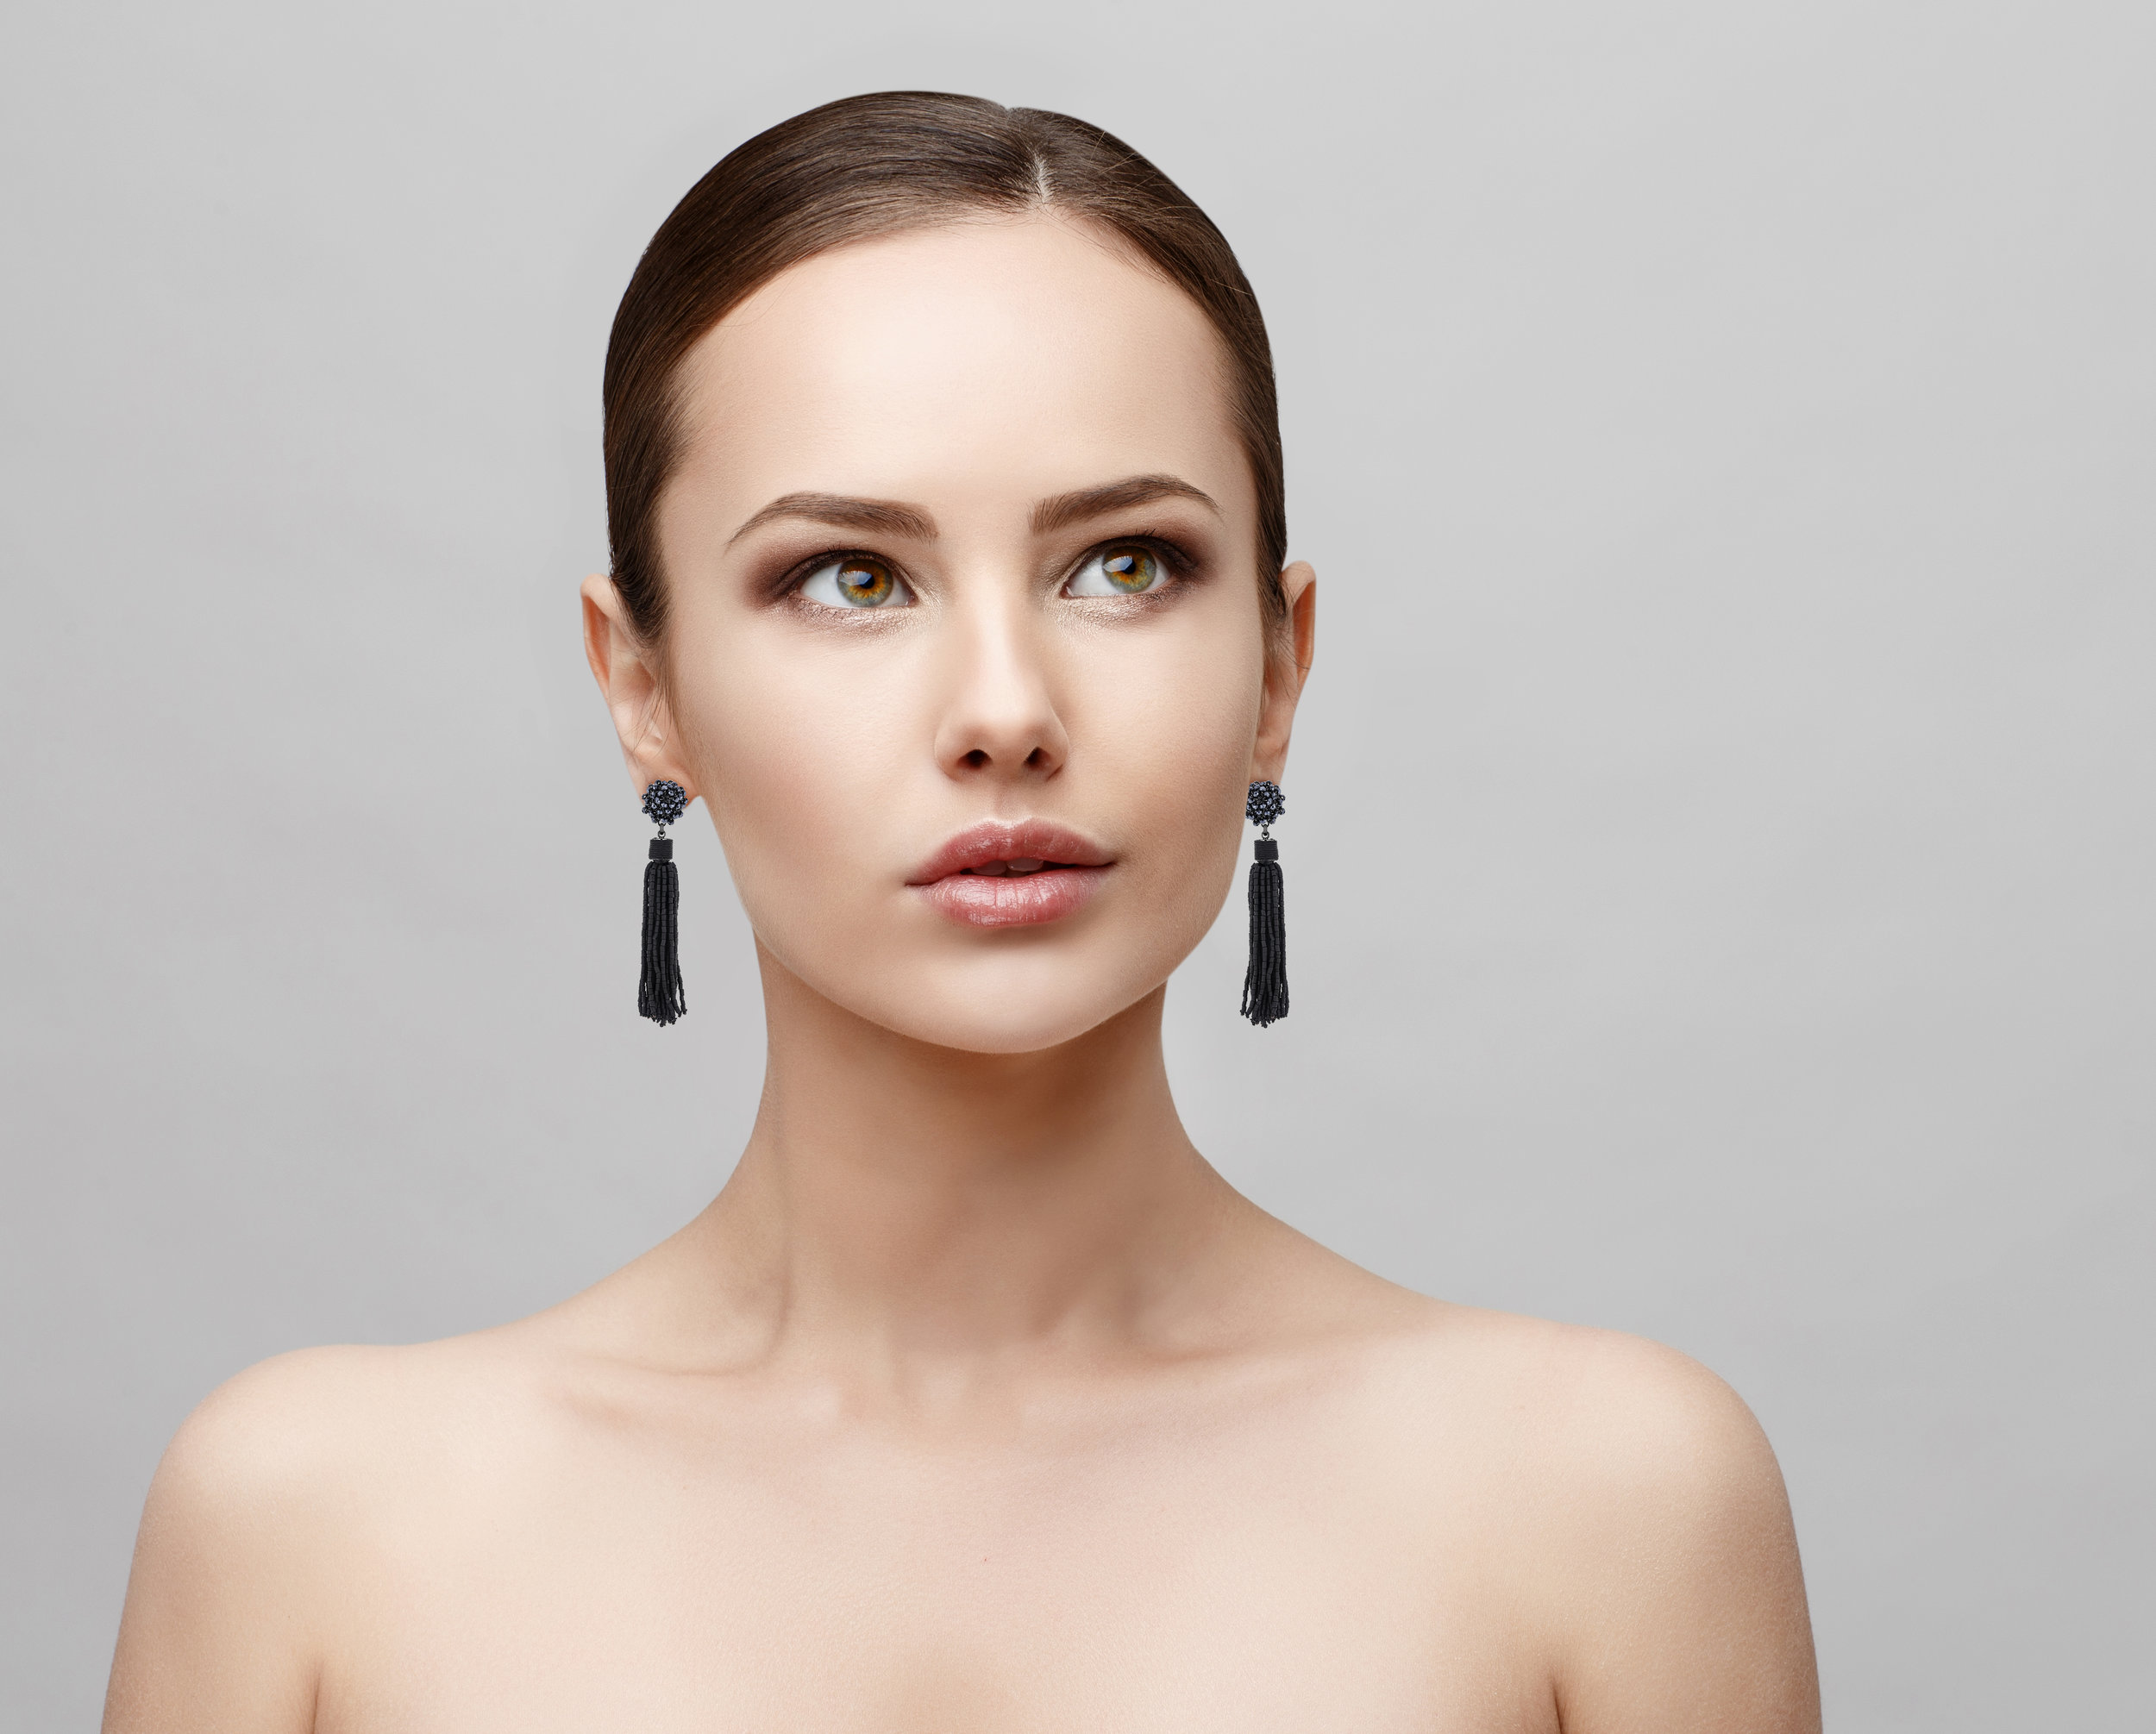 Model-CE9-Earrings (deleted b6c14c9123d114e8fbb9bdbe4c6214f4).jpg